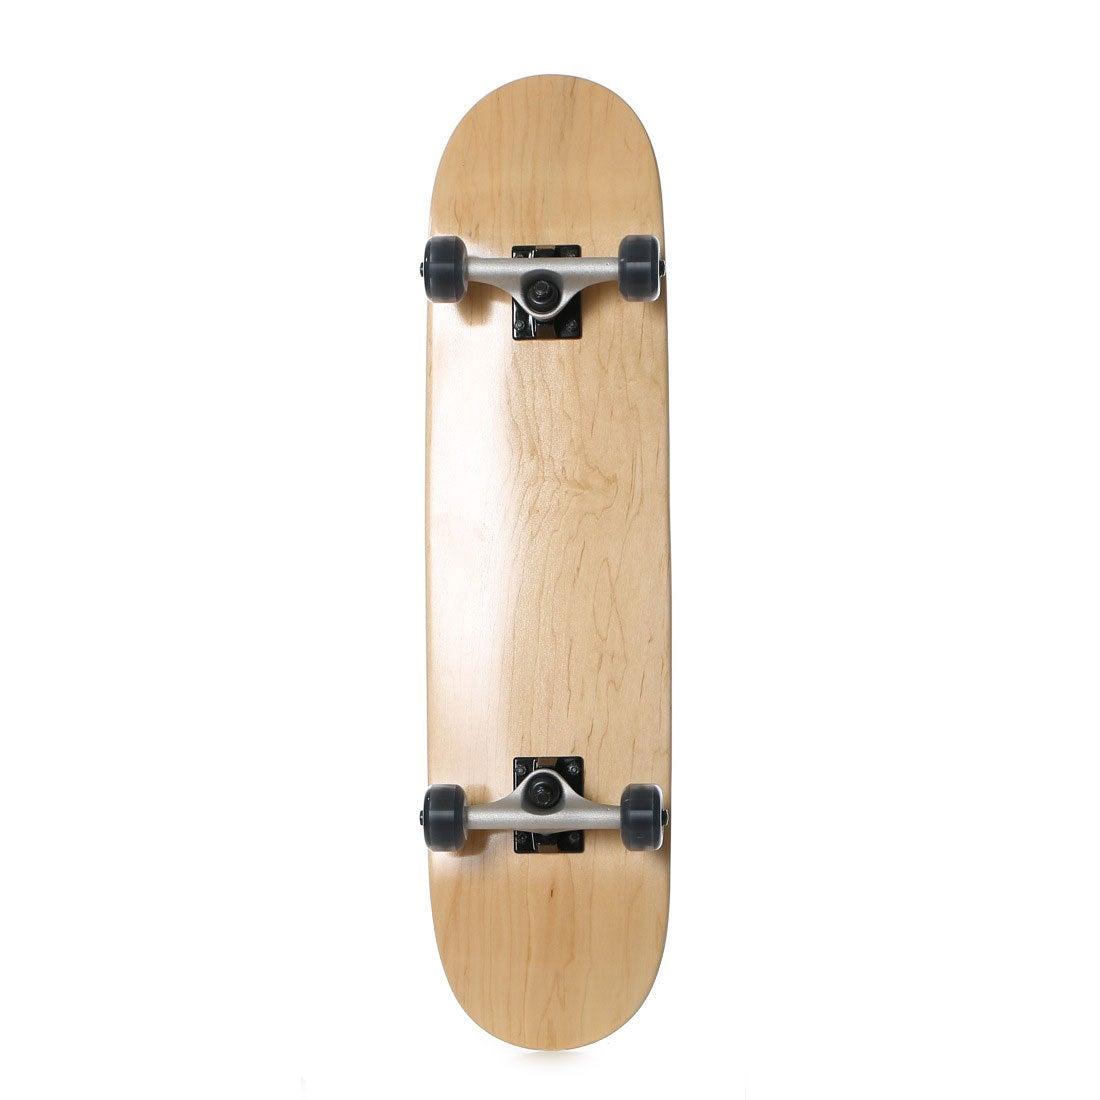 【SALE 5%OFF】シルバーフォックス Silver Fox ユニセックス エクストリームスポーツ ボード/スケート スケートボードコンプリート SB4001